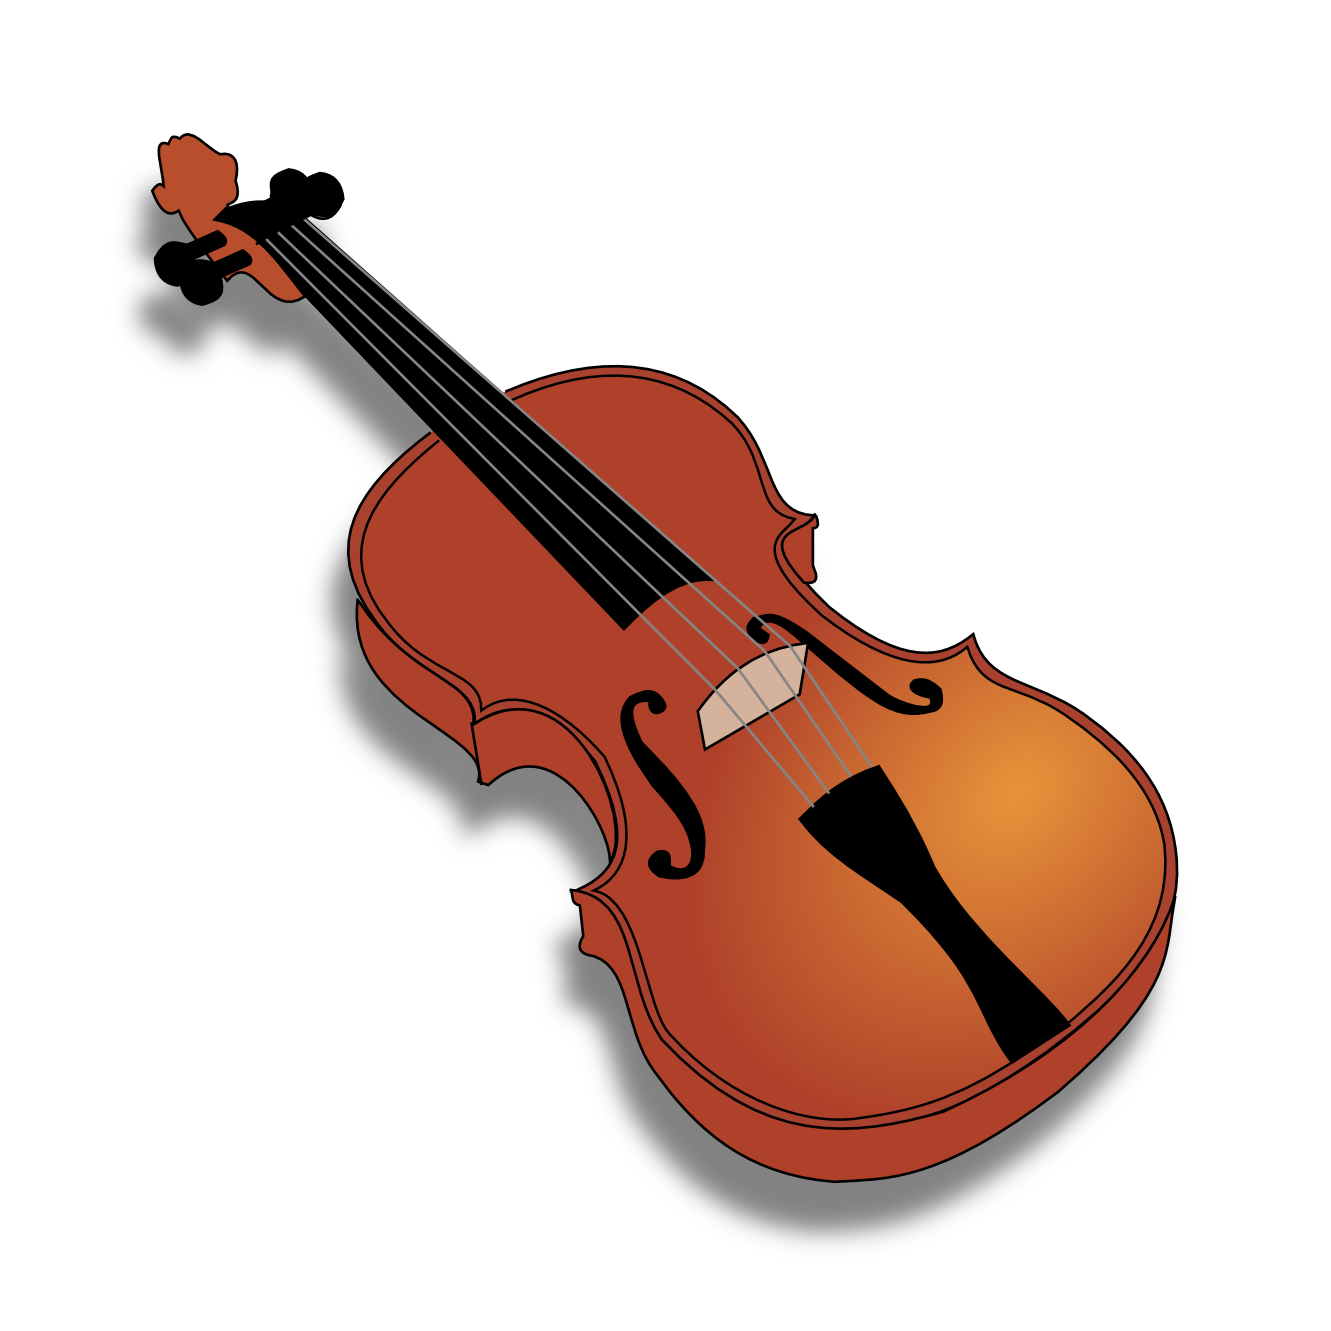 violin clip art google search clip art pinterest art google rh pinterest com fiddle player clipart fiddle player clipart